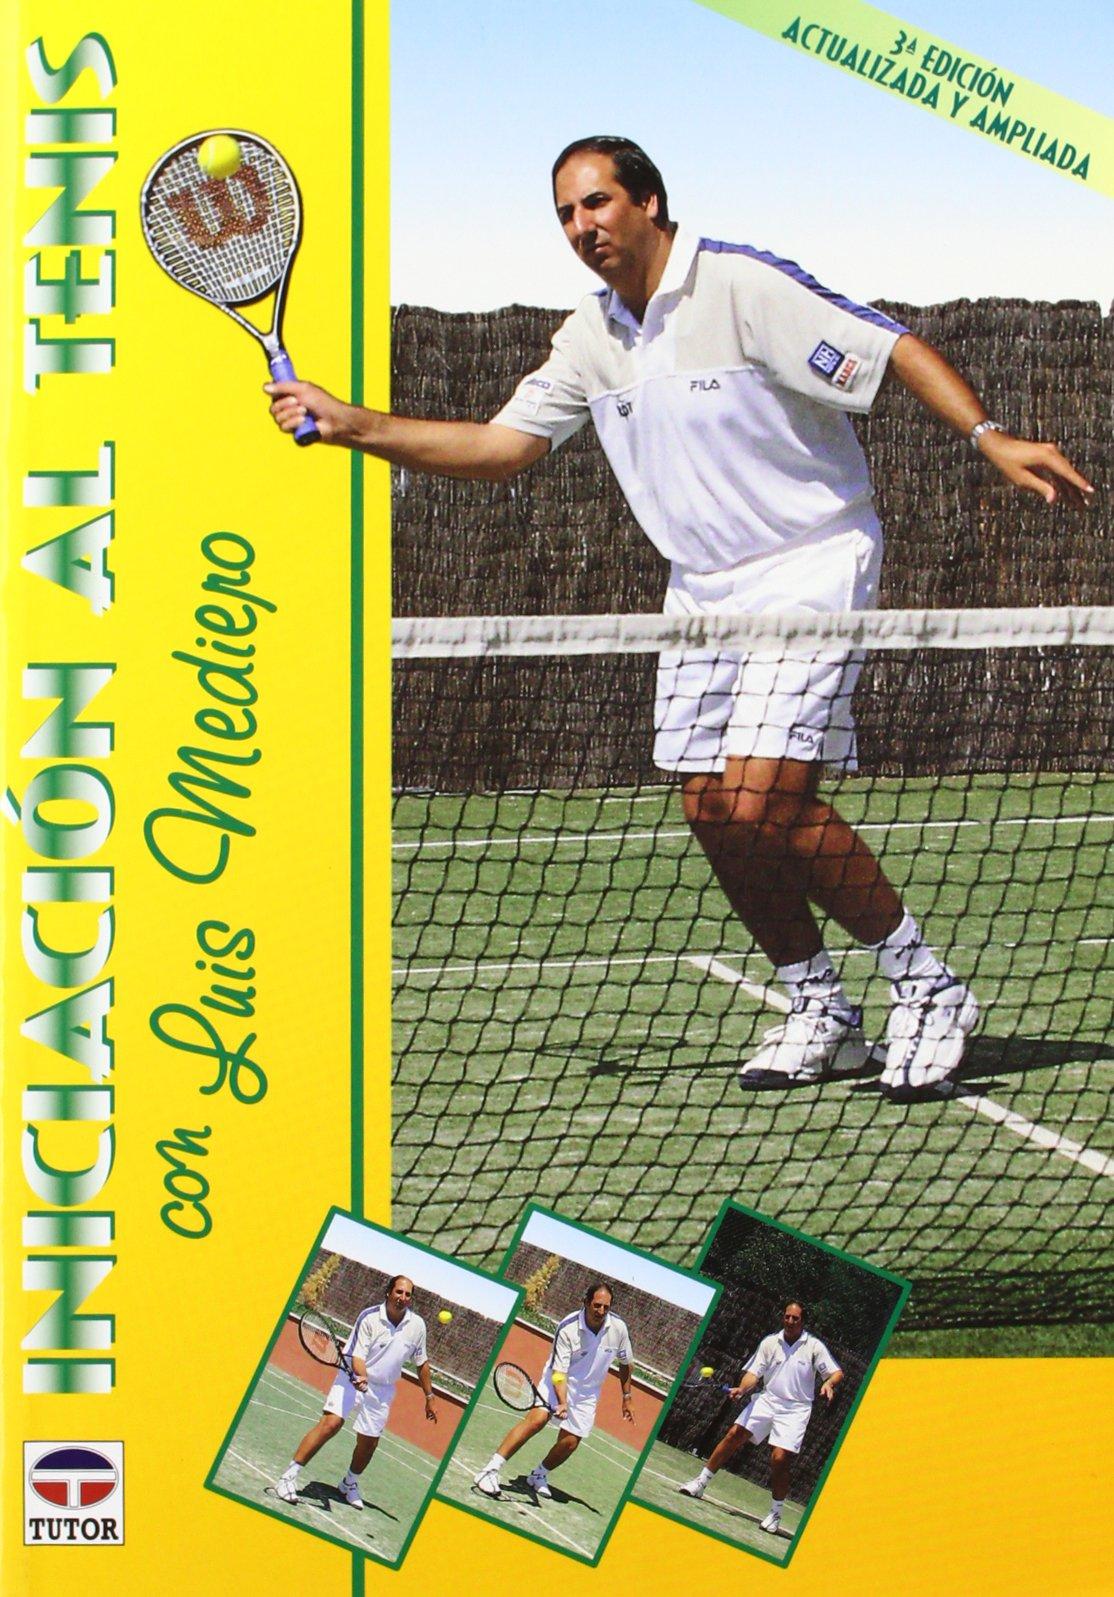 Iniciacion Al Tenis (Spanish Edition) (Spanish) Paperback – January, 2004